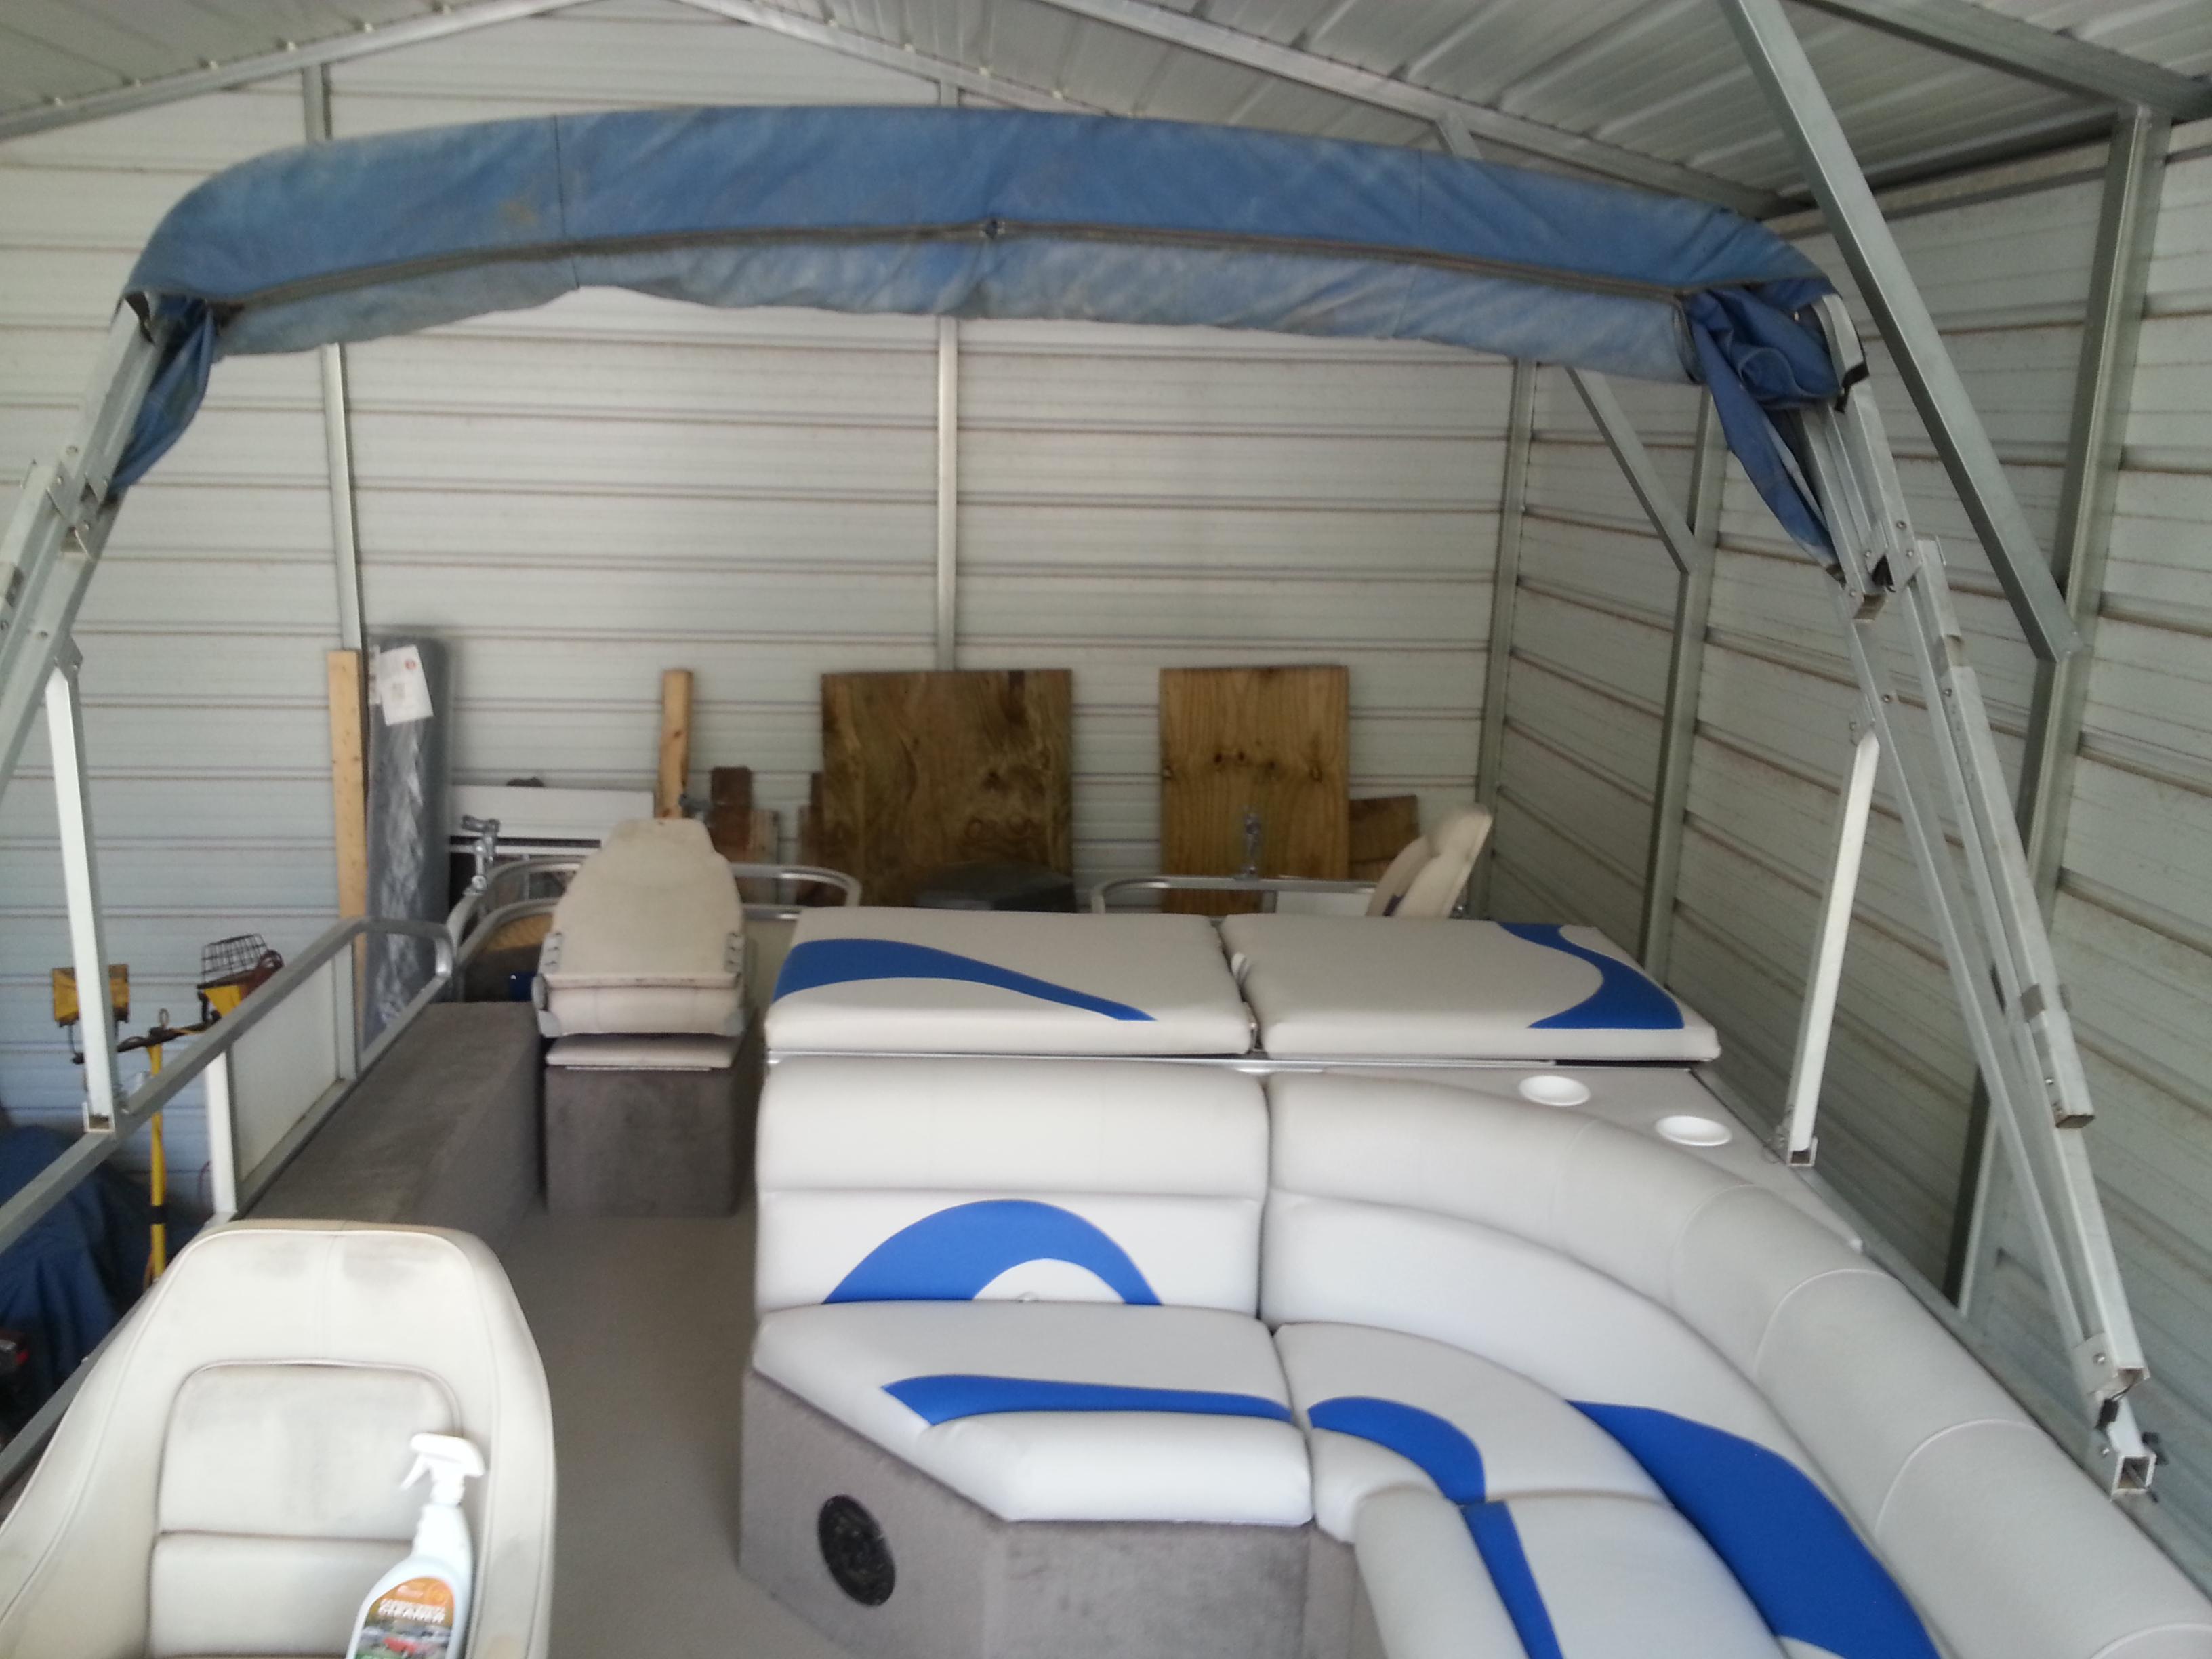 marine upholstery sc anchor stitch interior restoration. Black Bedroom Furniture Sets. Home Design Ideas